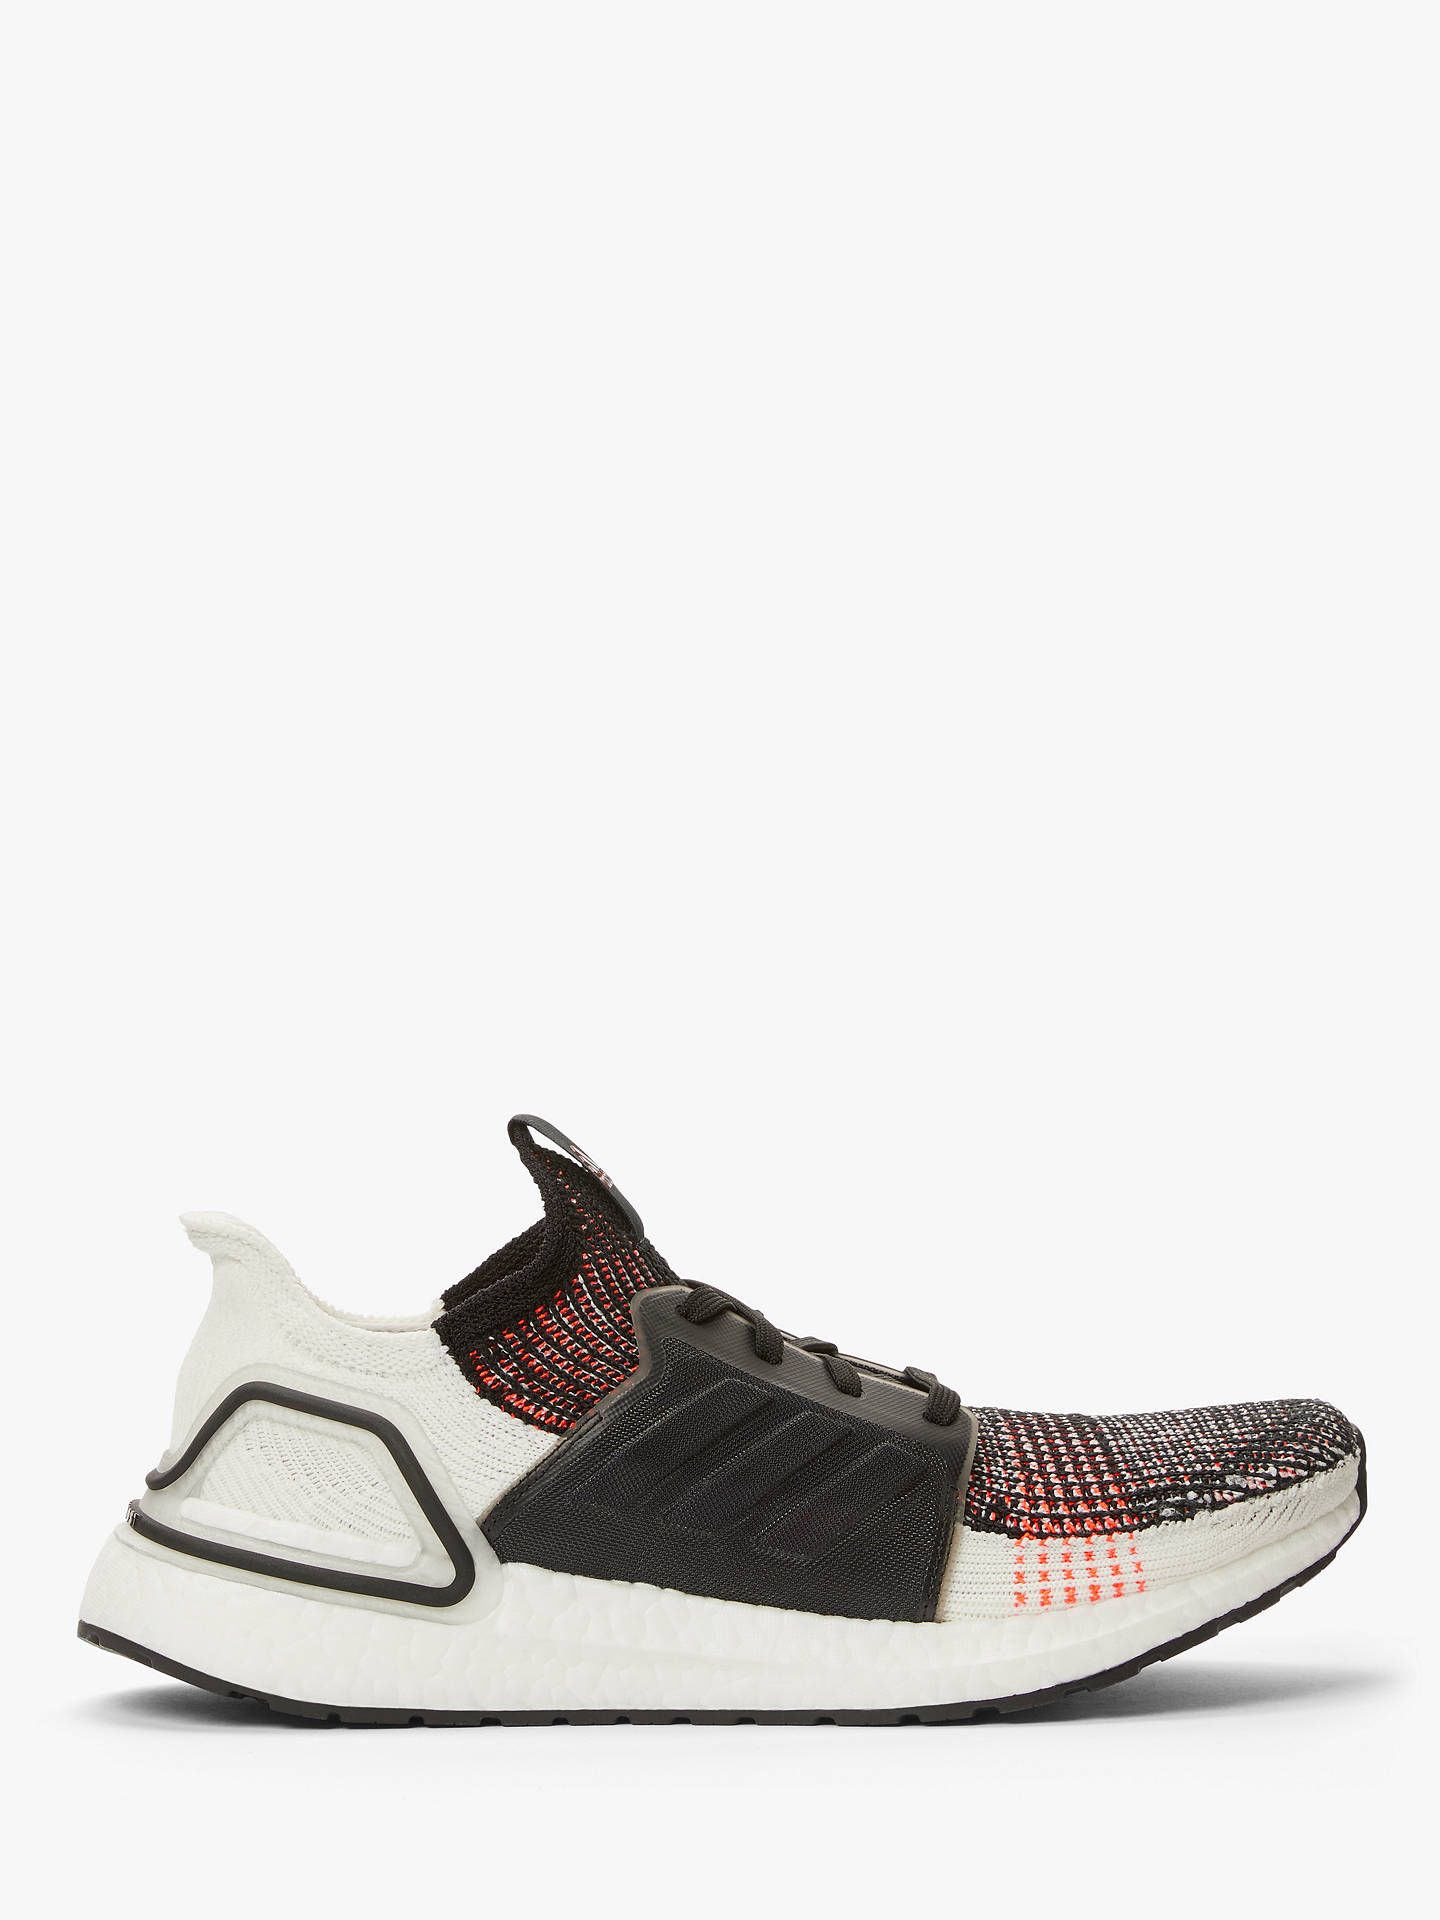 adidas UltraBOOST 19 Men's Running Shoes, Core BlackSolar